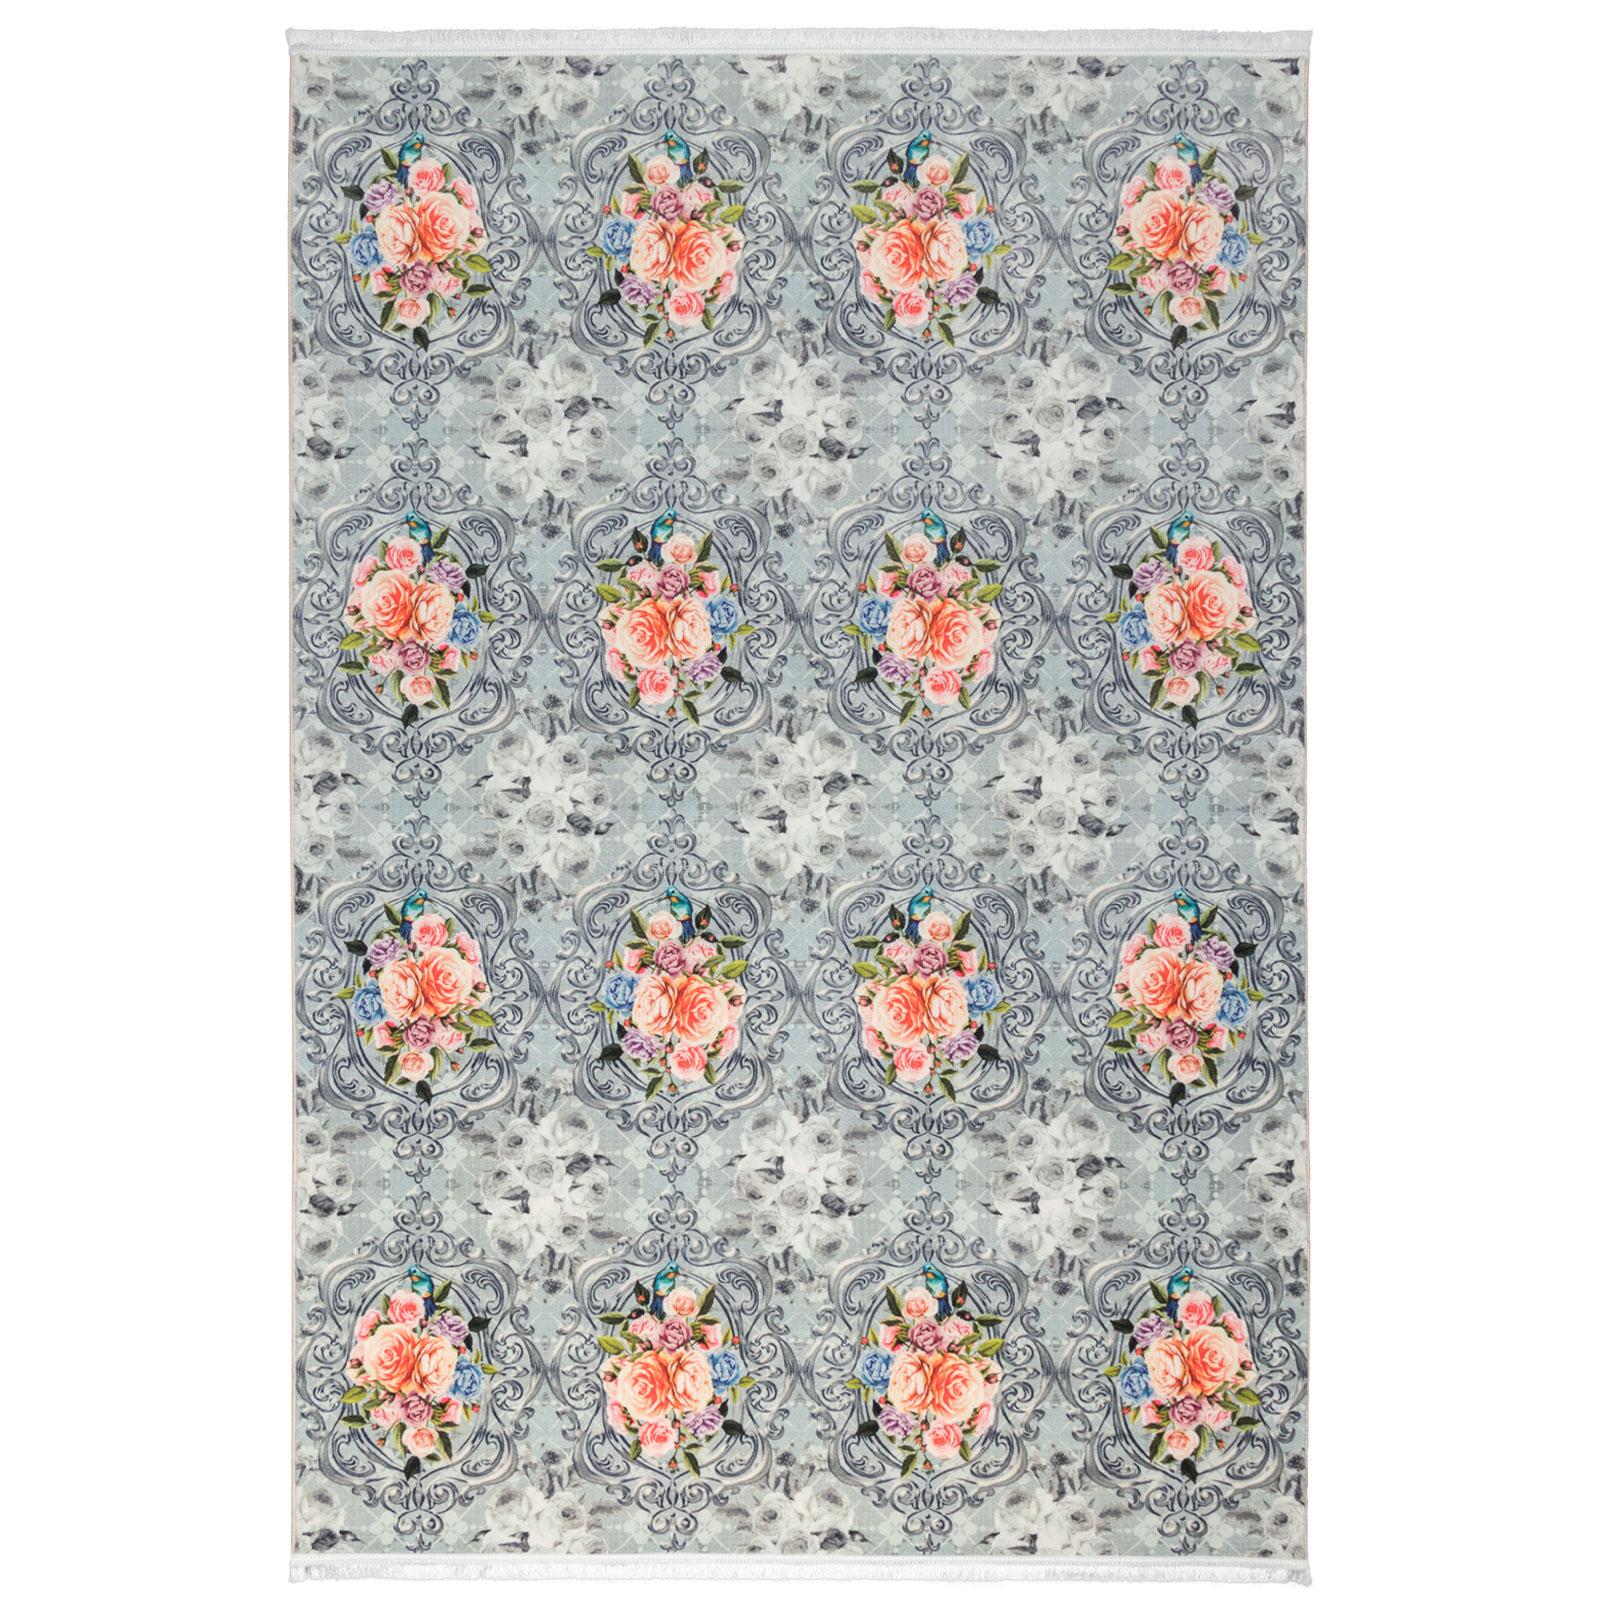 فرش ماشینی محتشم طرح گل کد 100444 زمینه فیلی